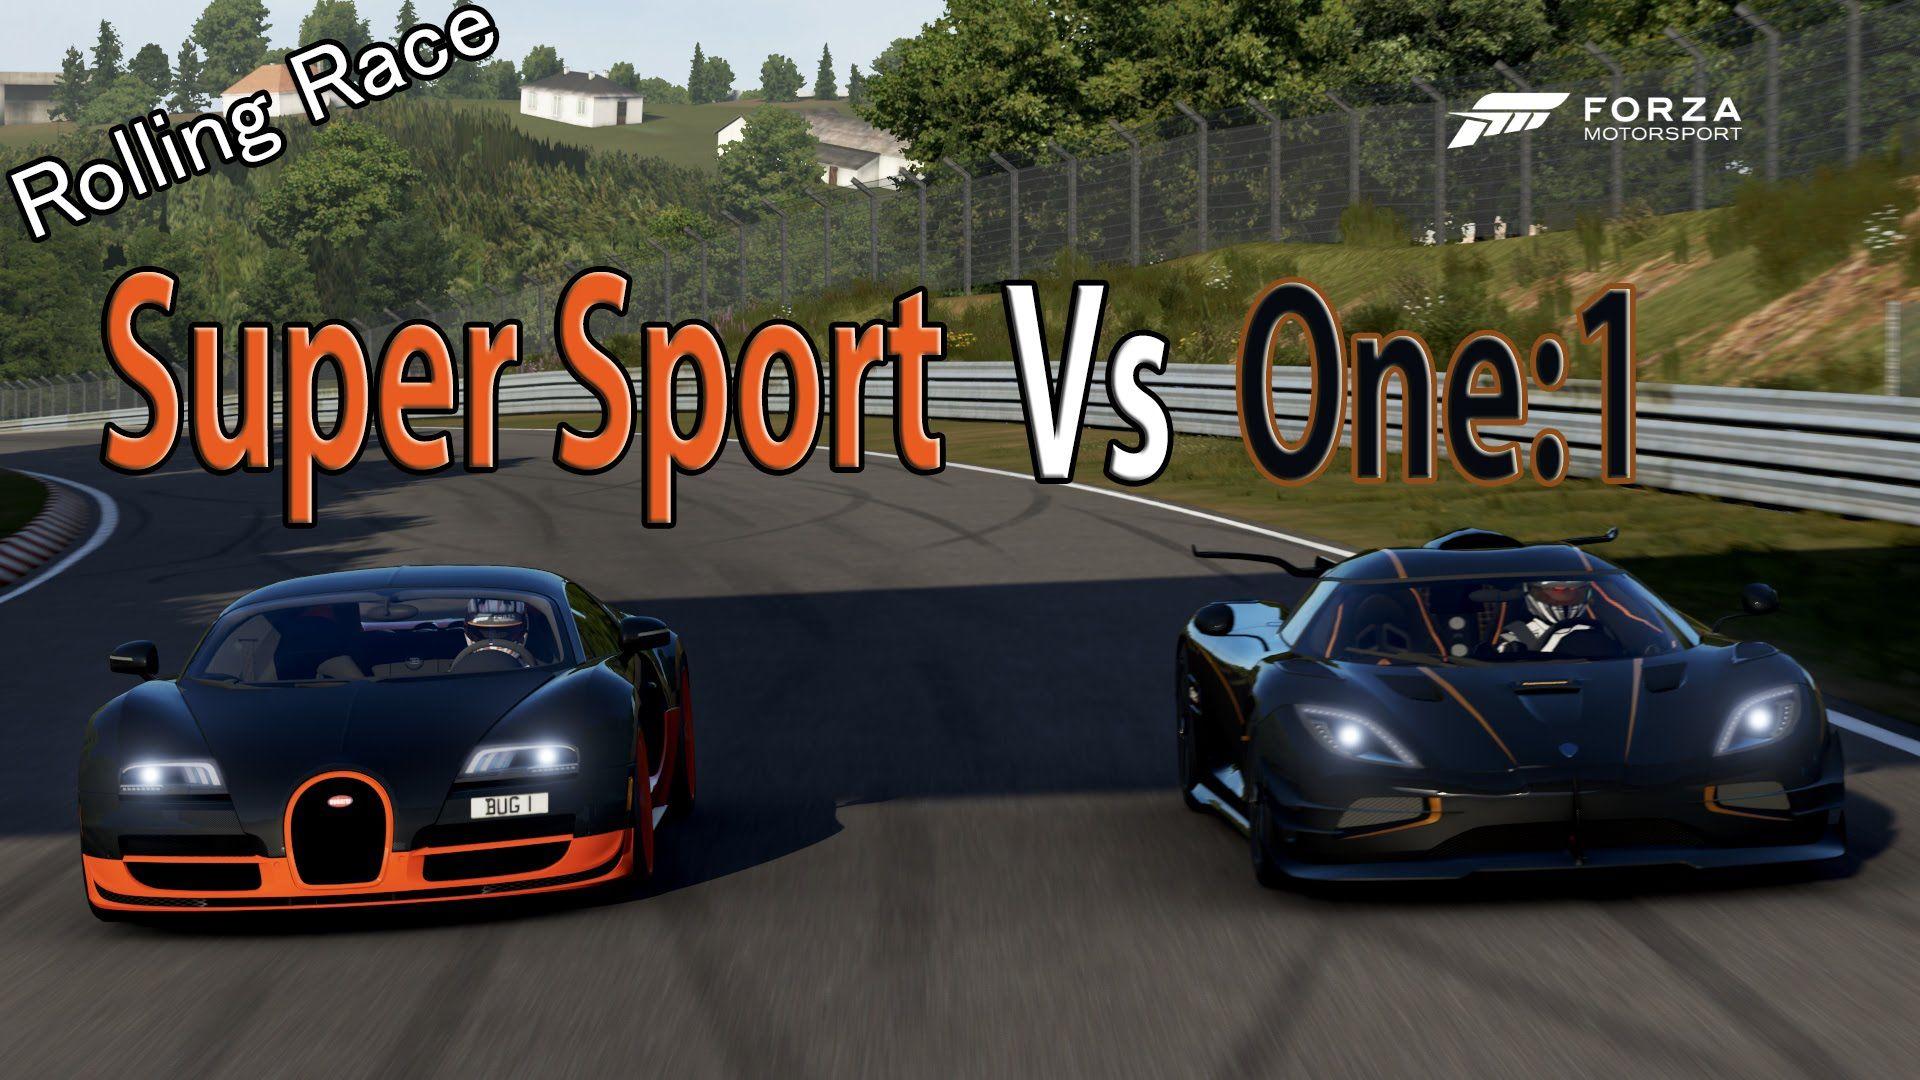 dba1714ecb83ce439530ca5f93d81e20 Wonderful Bugatti Veyron Xbox 360 Games Cars Trend